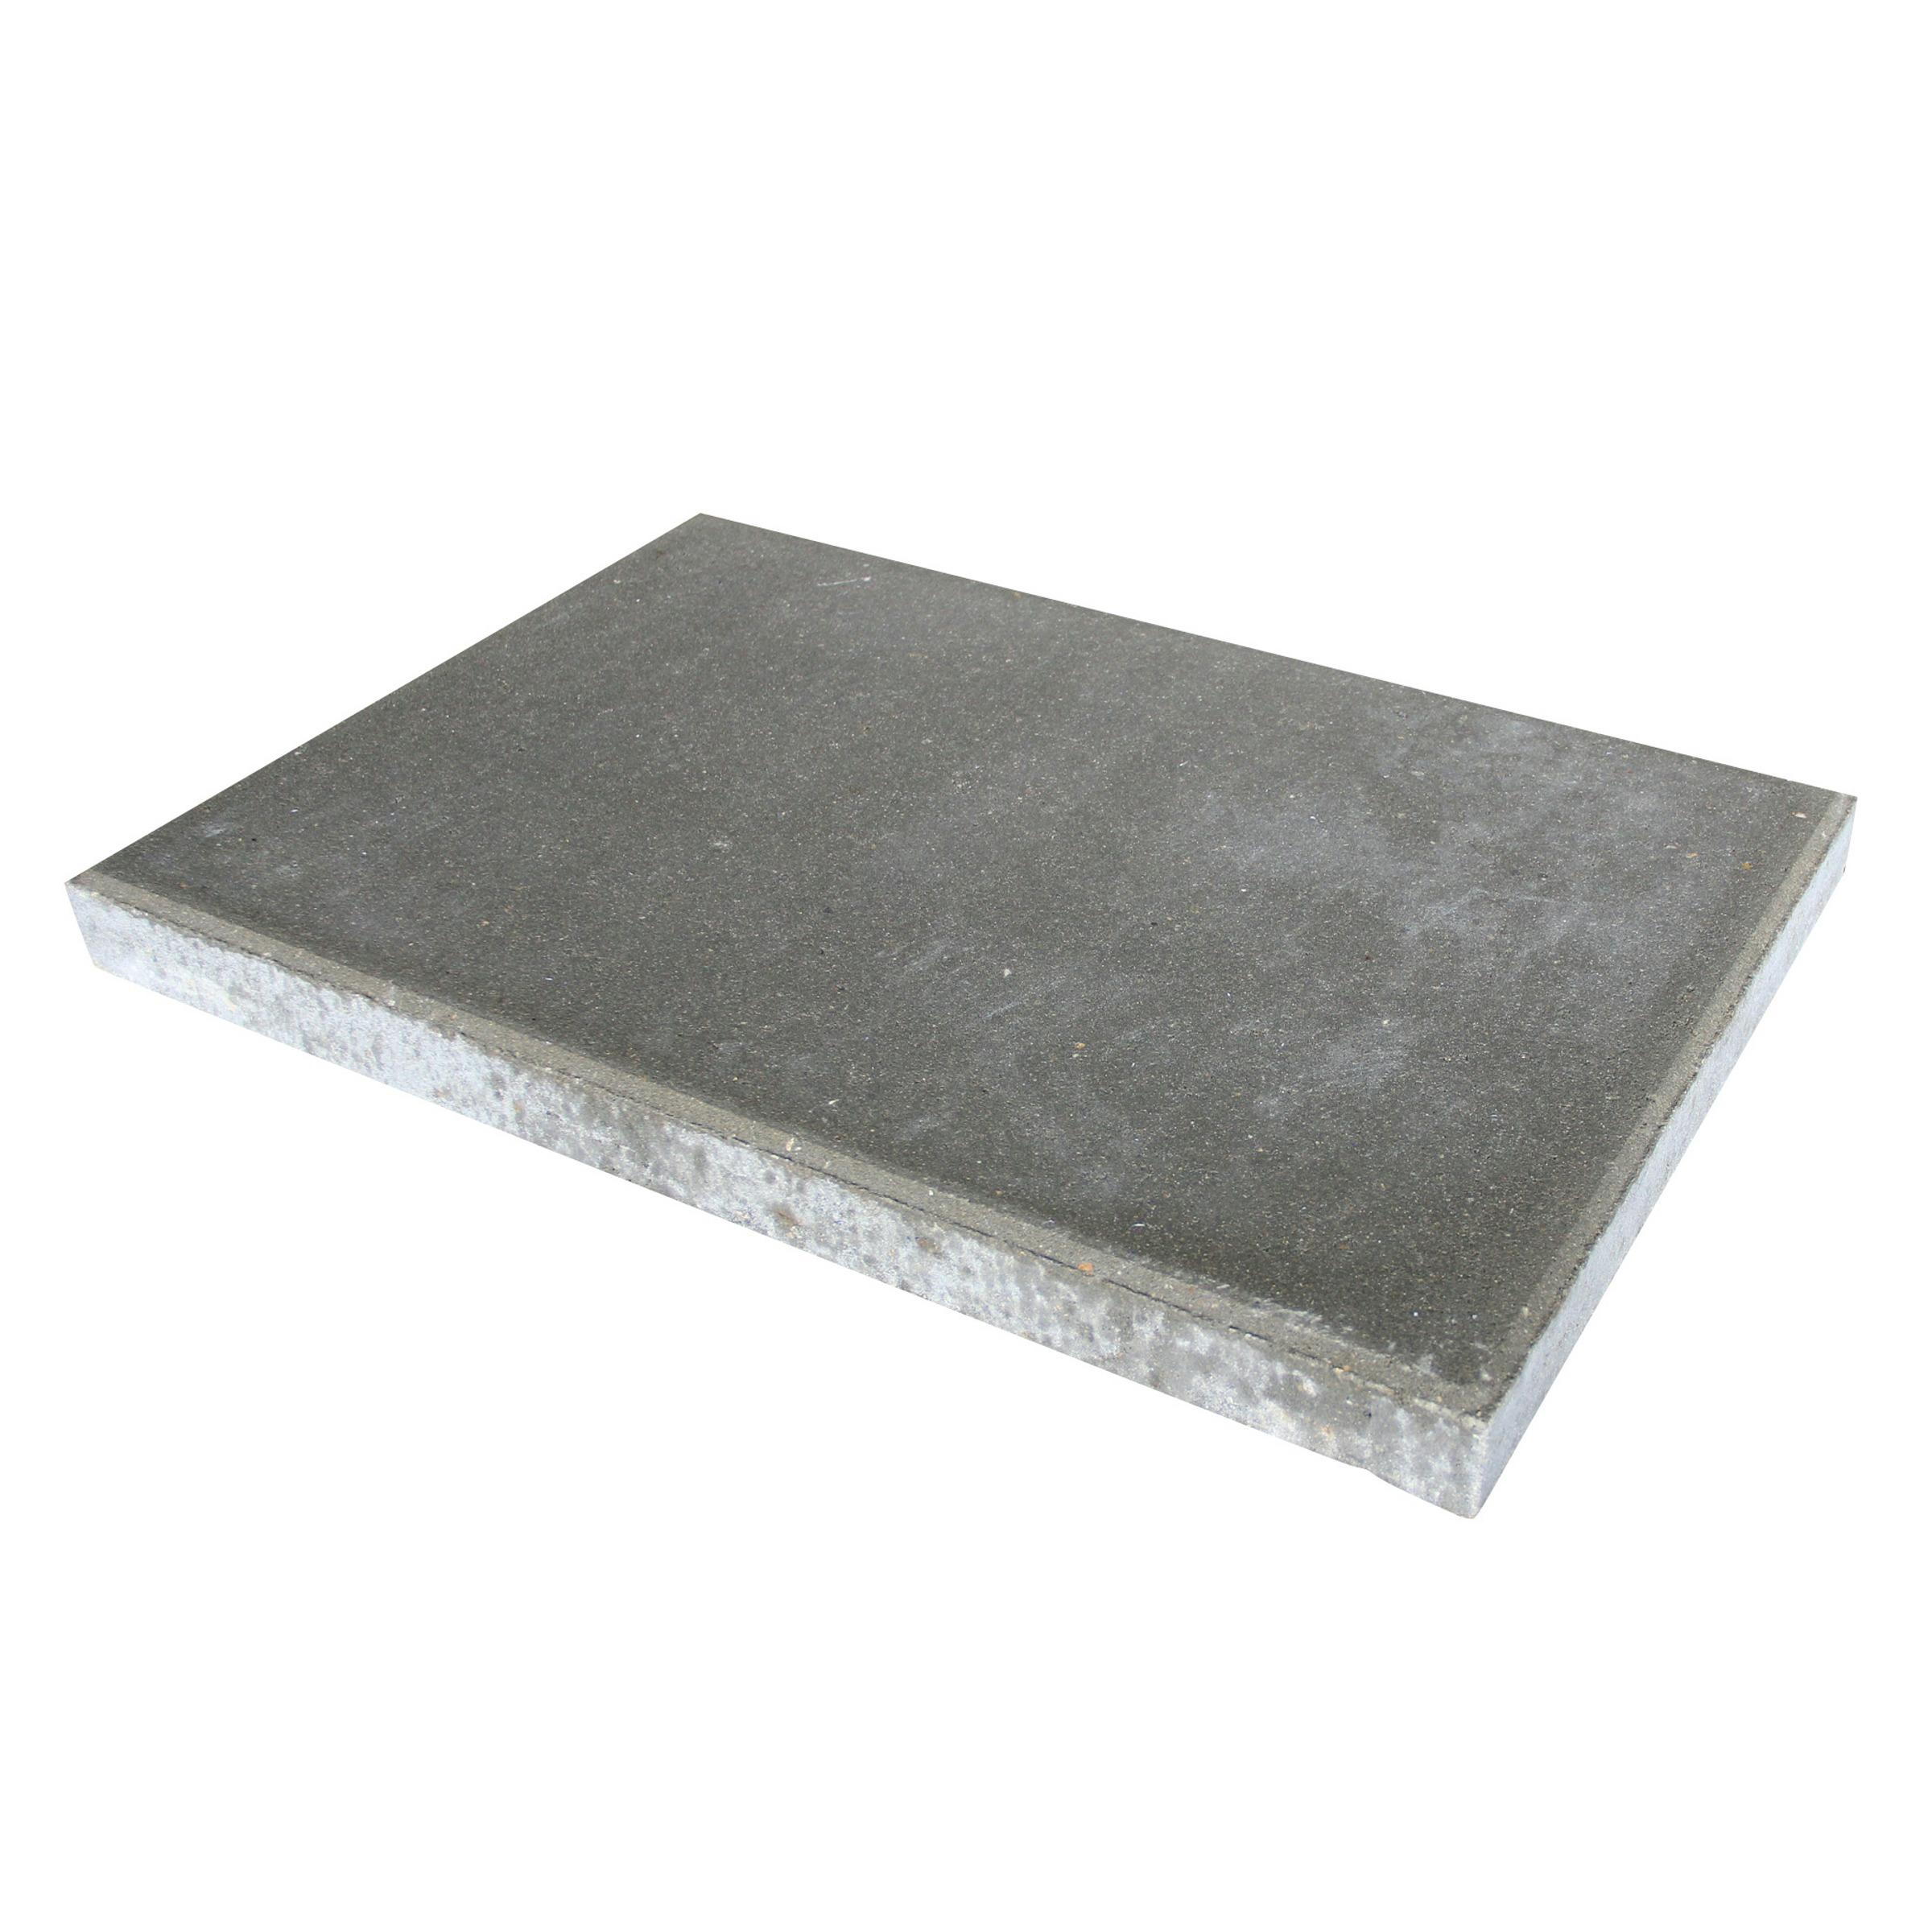 Betontegel Grijs 60x40 cm - Per Tegel - 0,24 m2